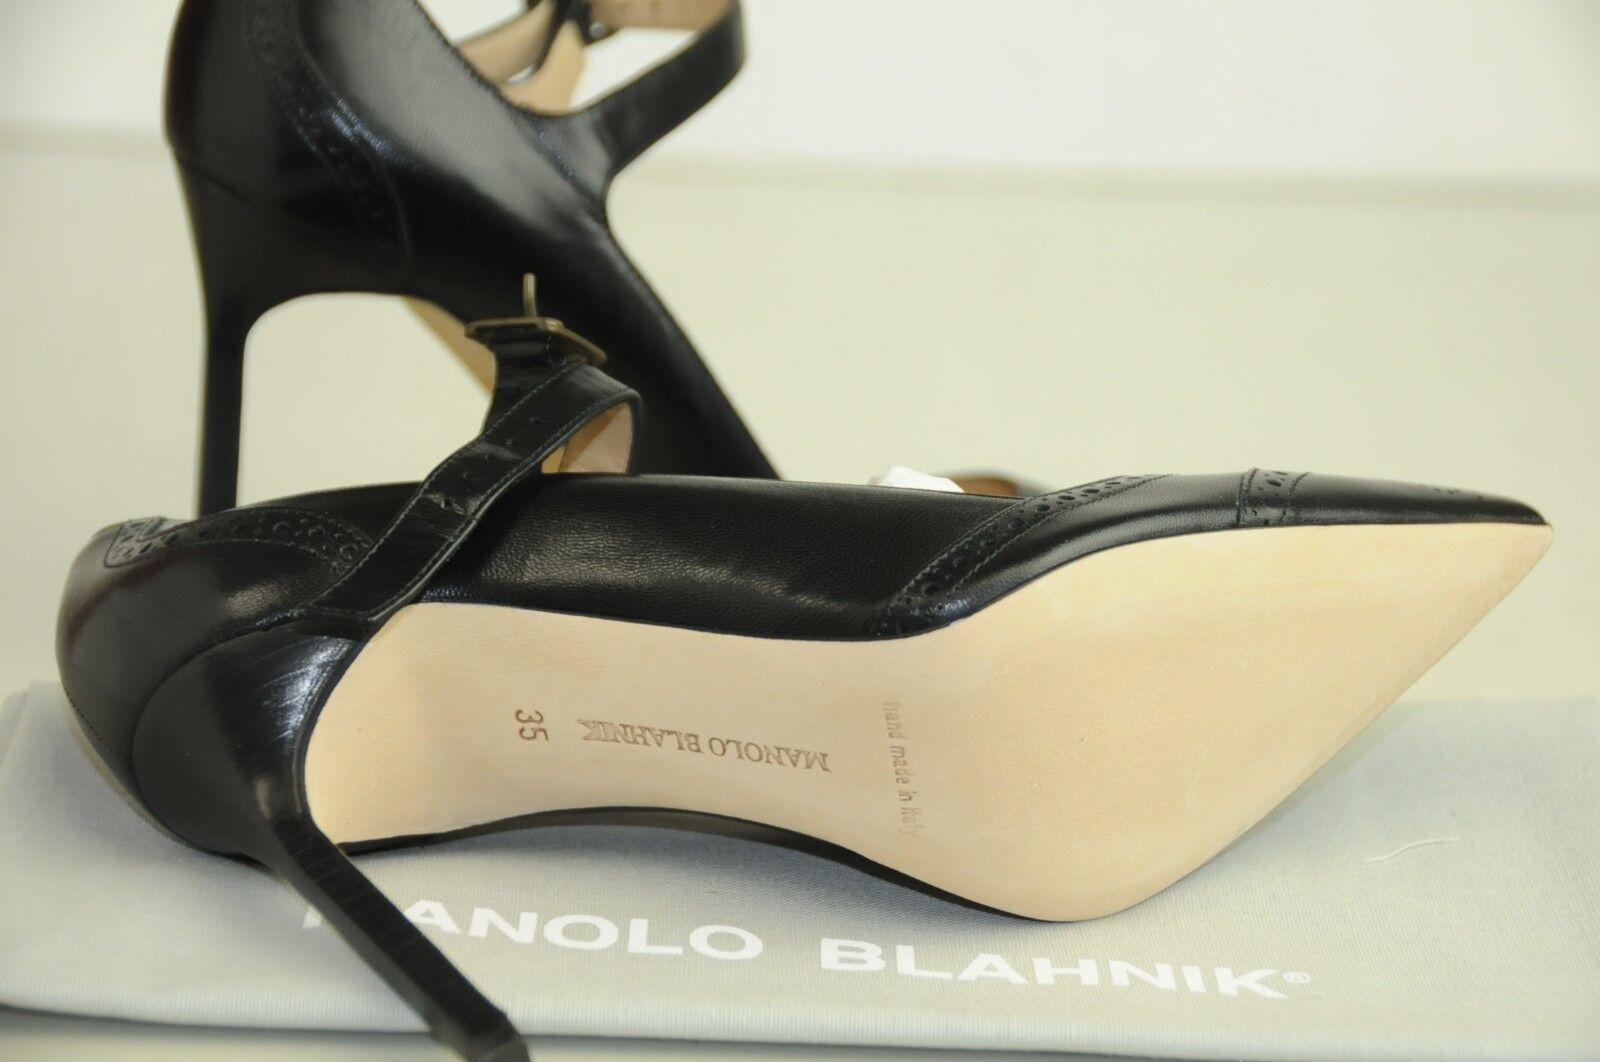 Neu Manolo Blahnik Bb Cabras 105 Schwarz Mary Mary Mary Jane Pumps Schuhe 35 37 38.5 39 27fc07